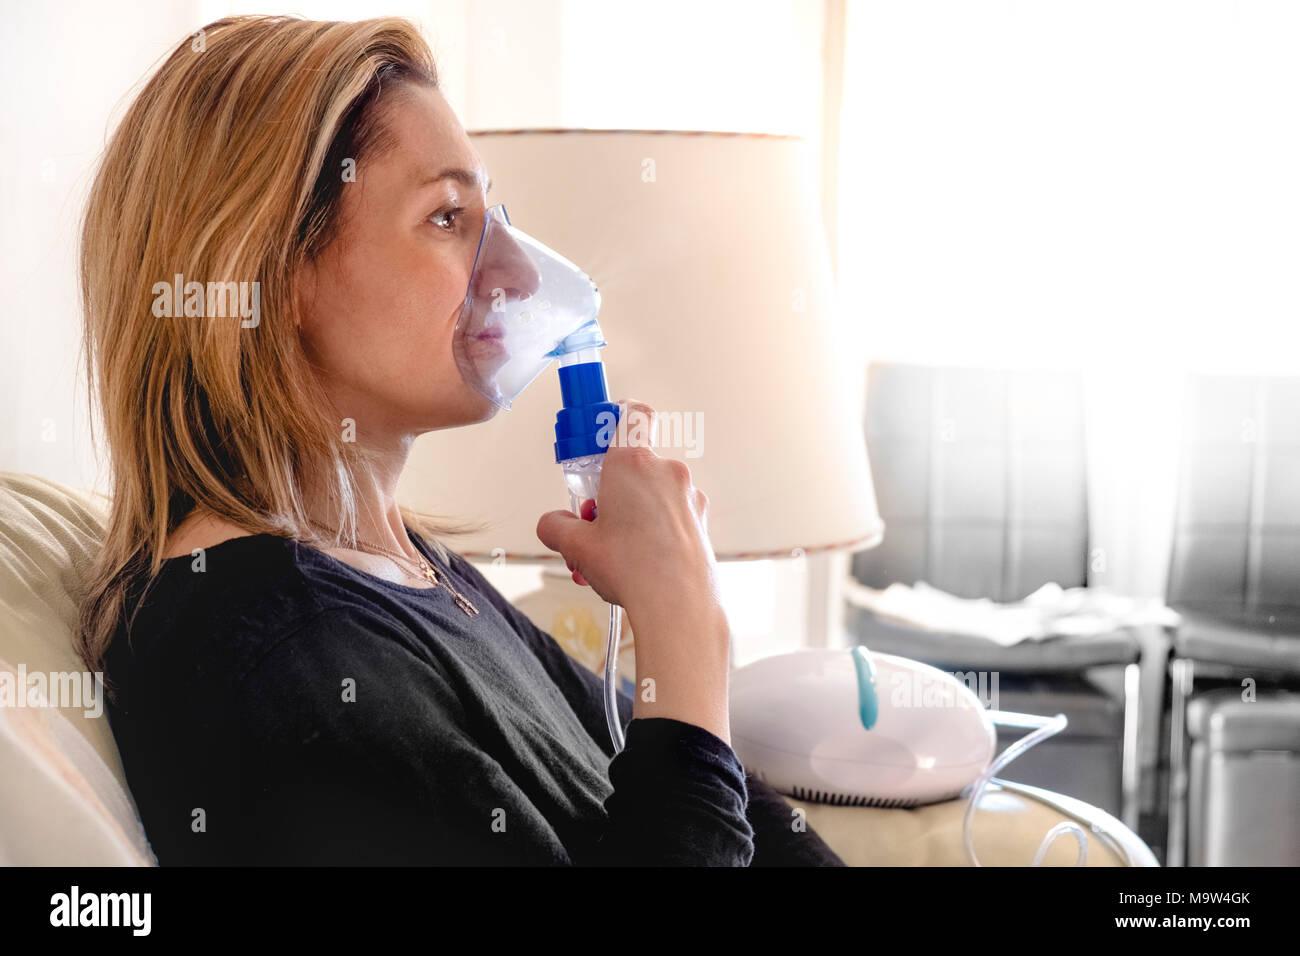 nebulizer aerosol woman inhaler machine medicine at home - Stock Image